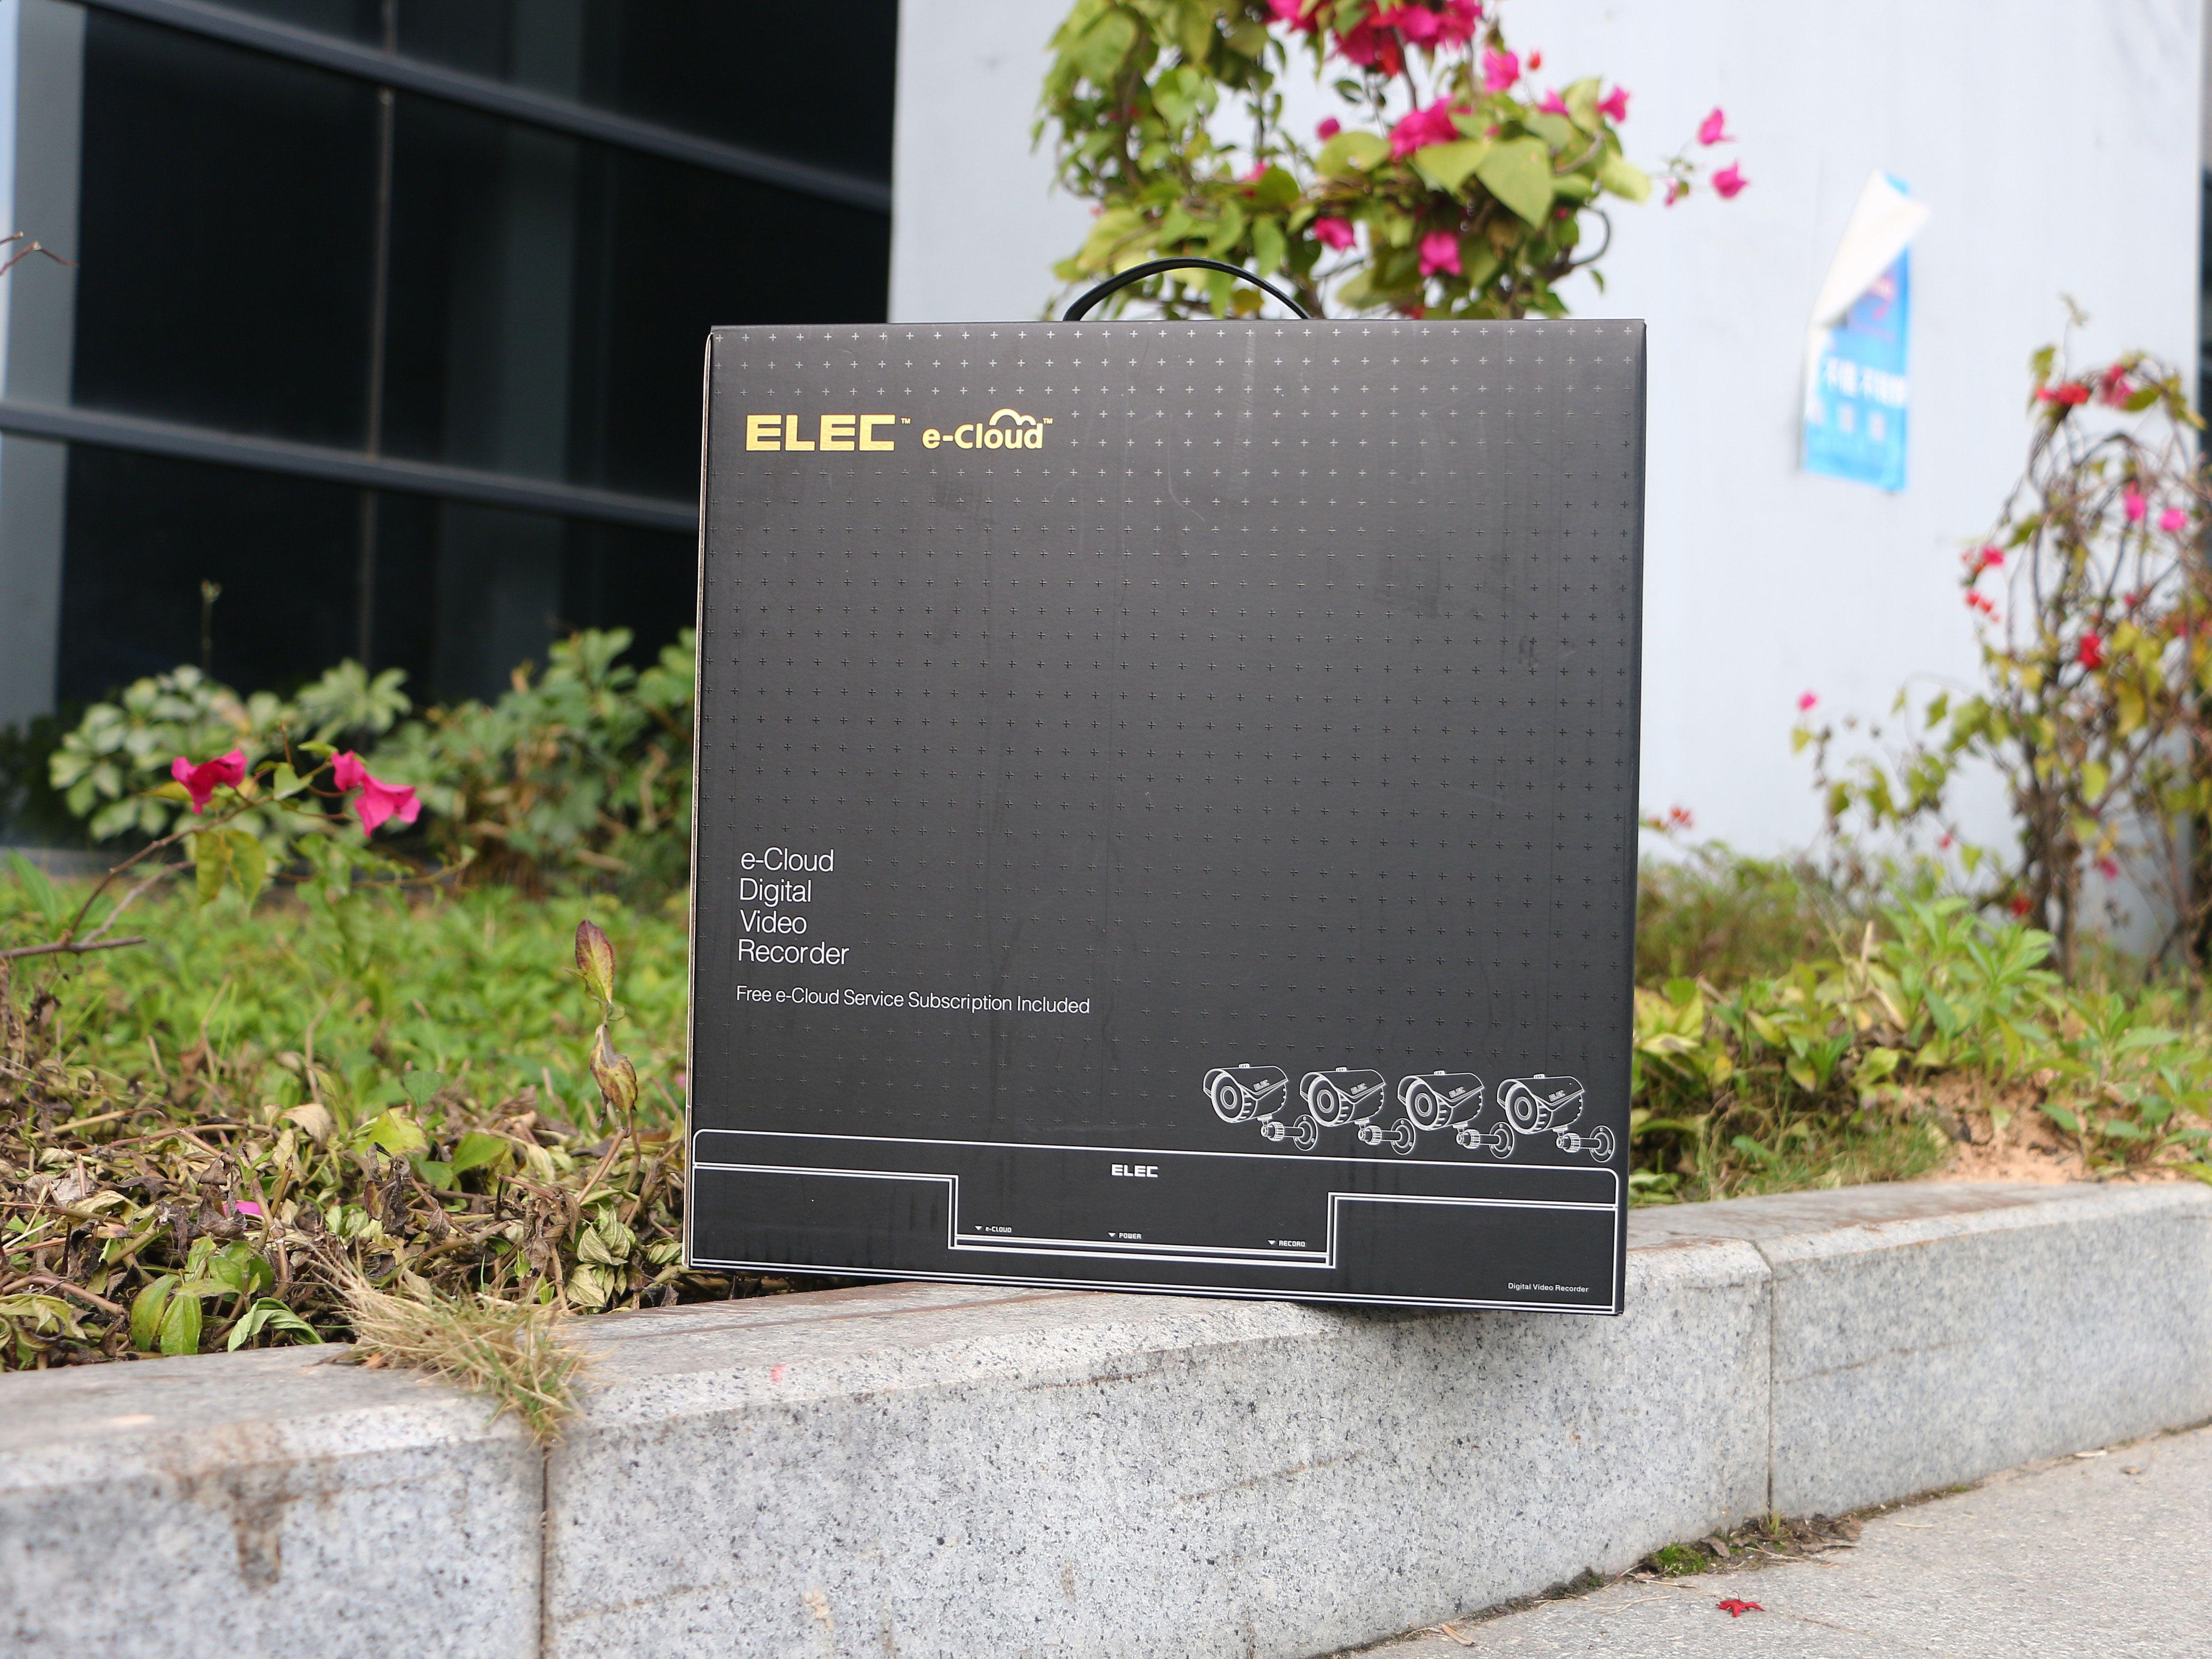 outer-package | ELEC surveillance dvr kit & security cameras ...